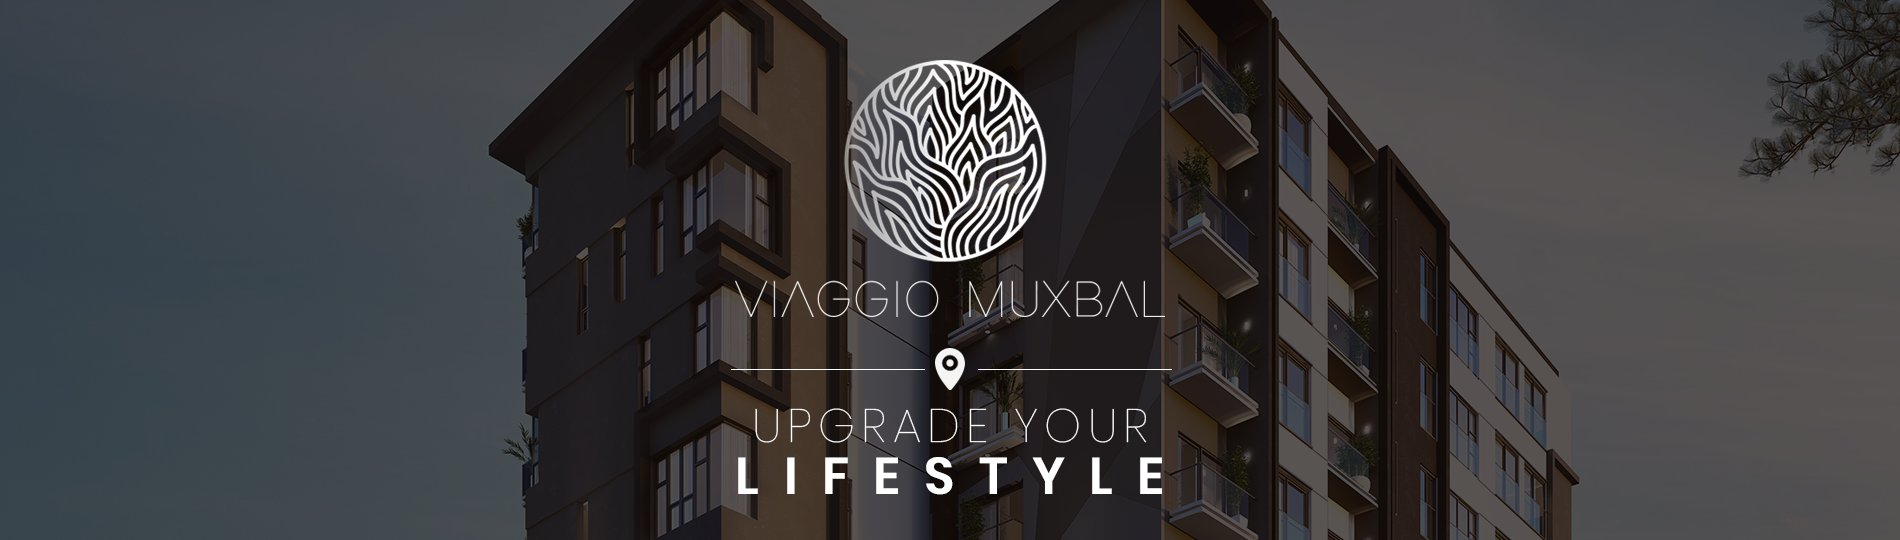 imagen principal con logo de Viaggio Muxbal